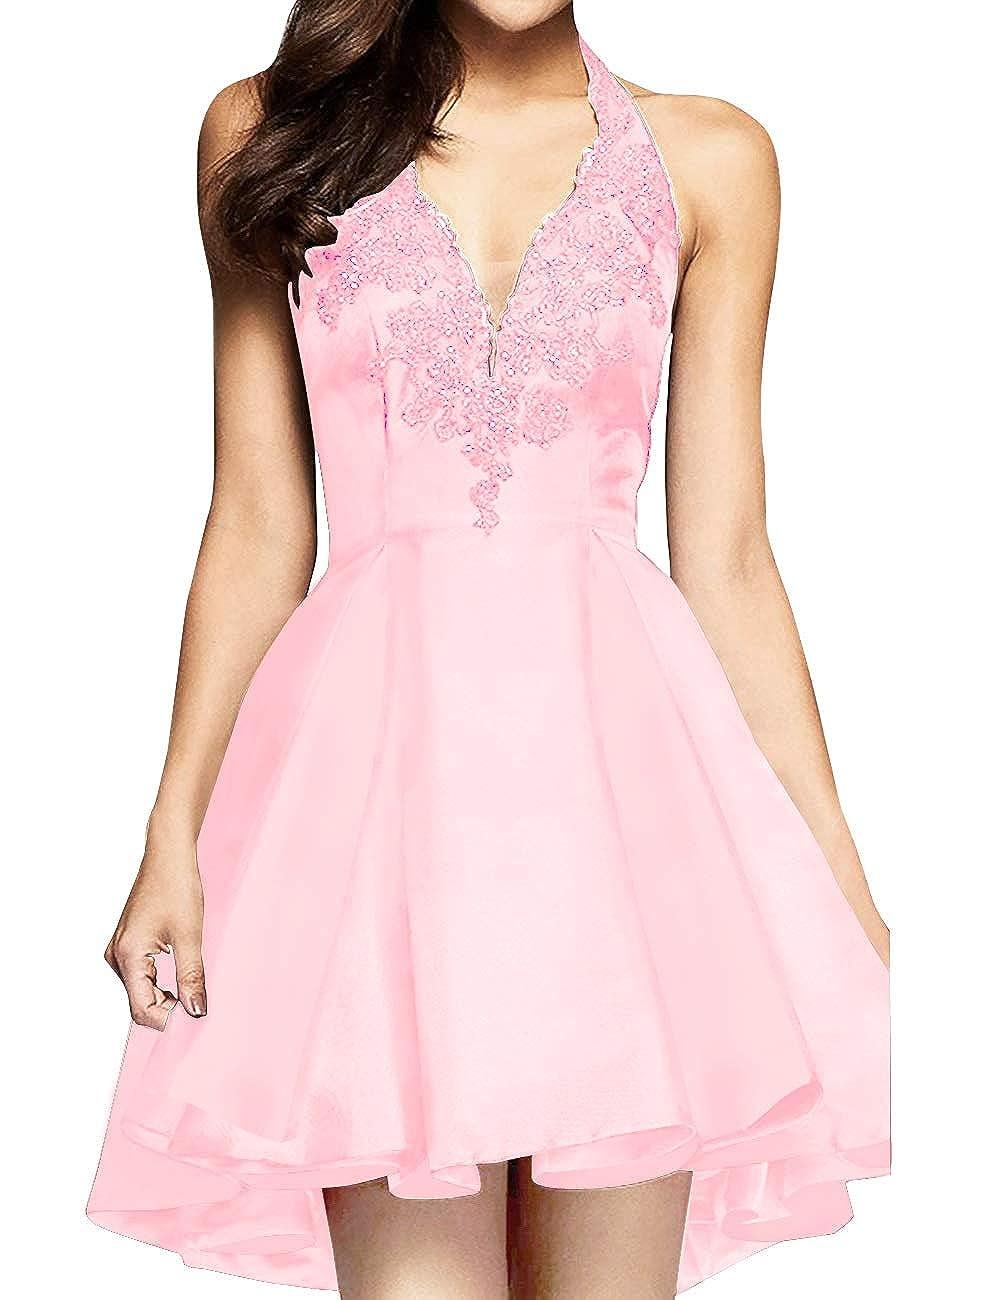 bluesh Pink MorySong Women's Applique Lace Satin Halter Neck Short Homecoming Cocktail Dress